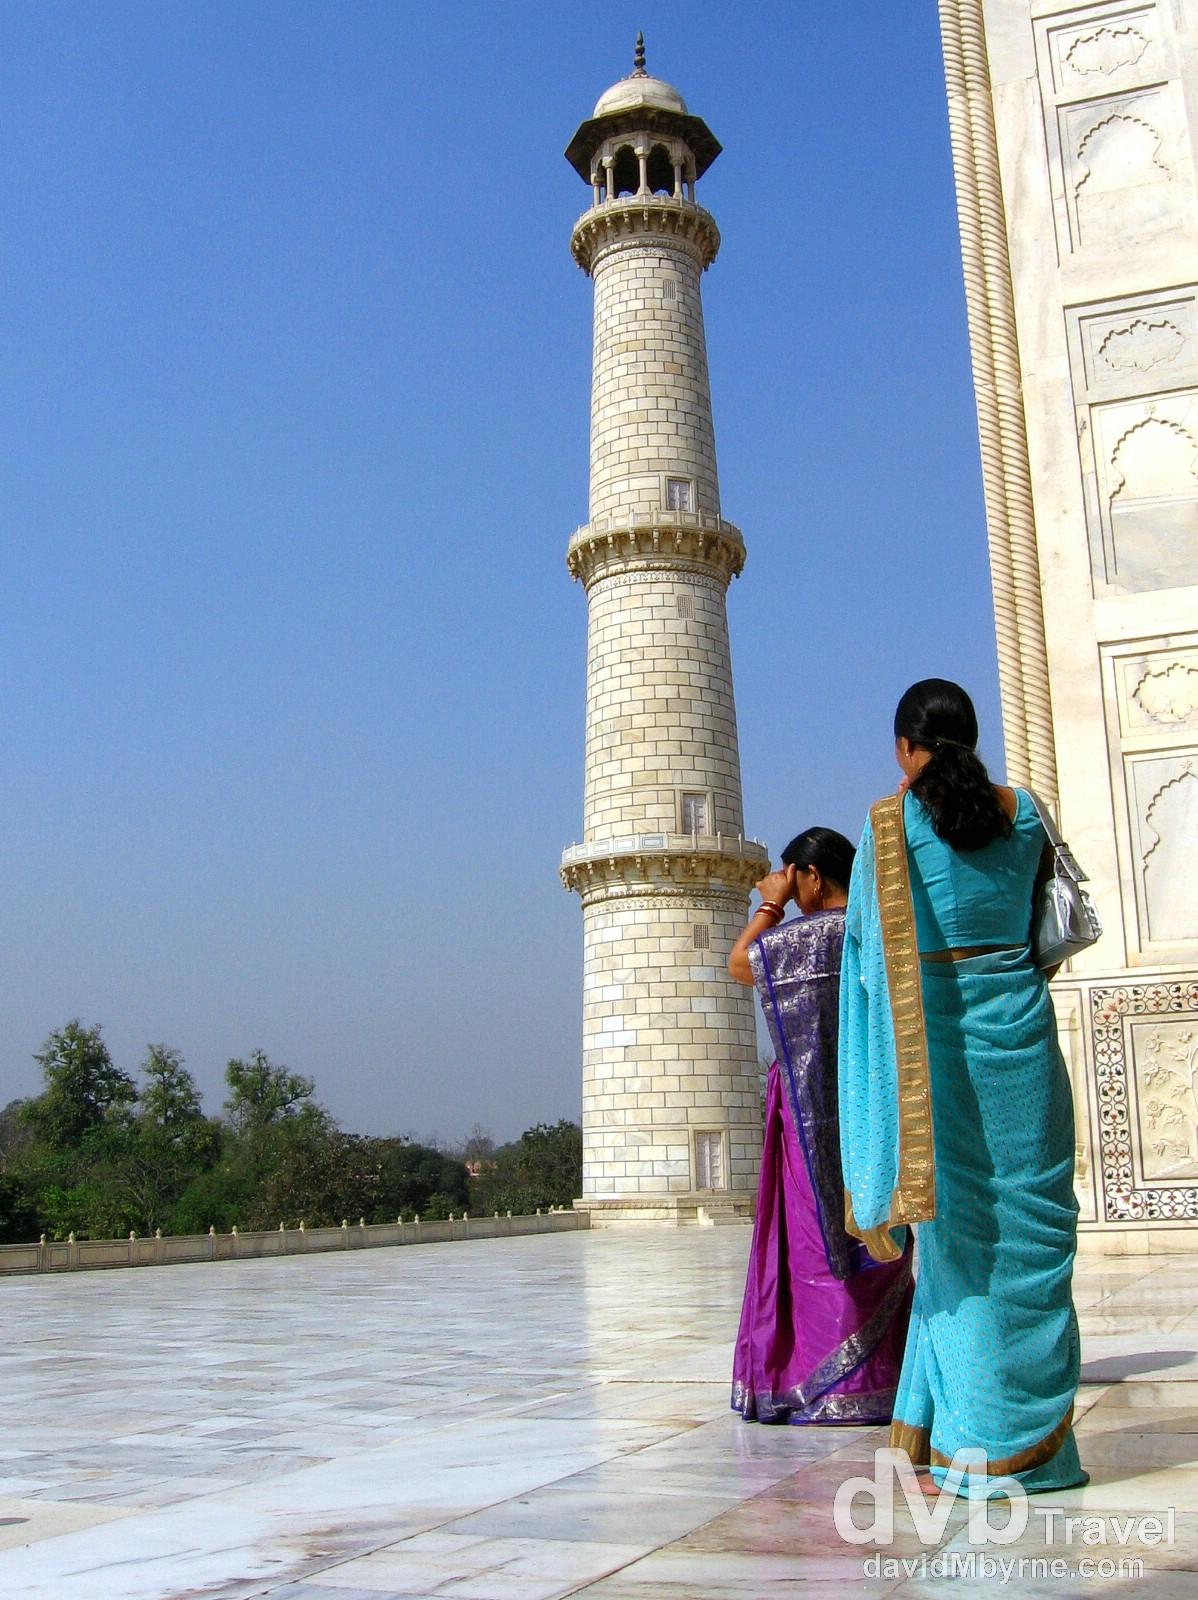 Exiting the central chamber of the Taj Mahal, Agra, Uttar Pradesh, India. March 25, 2008.